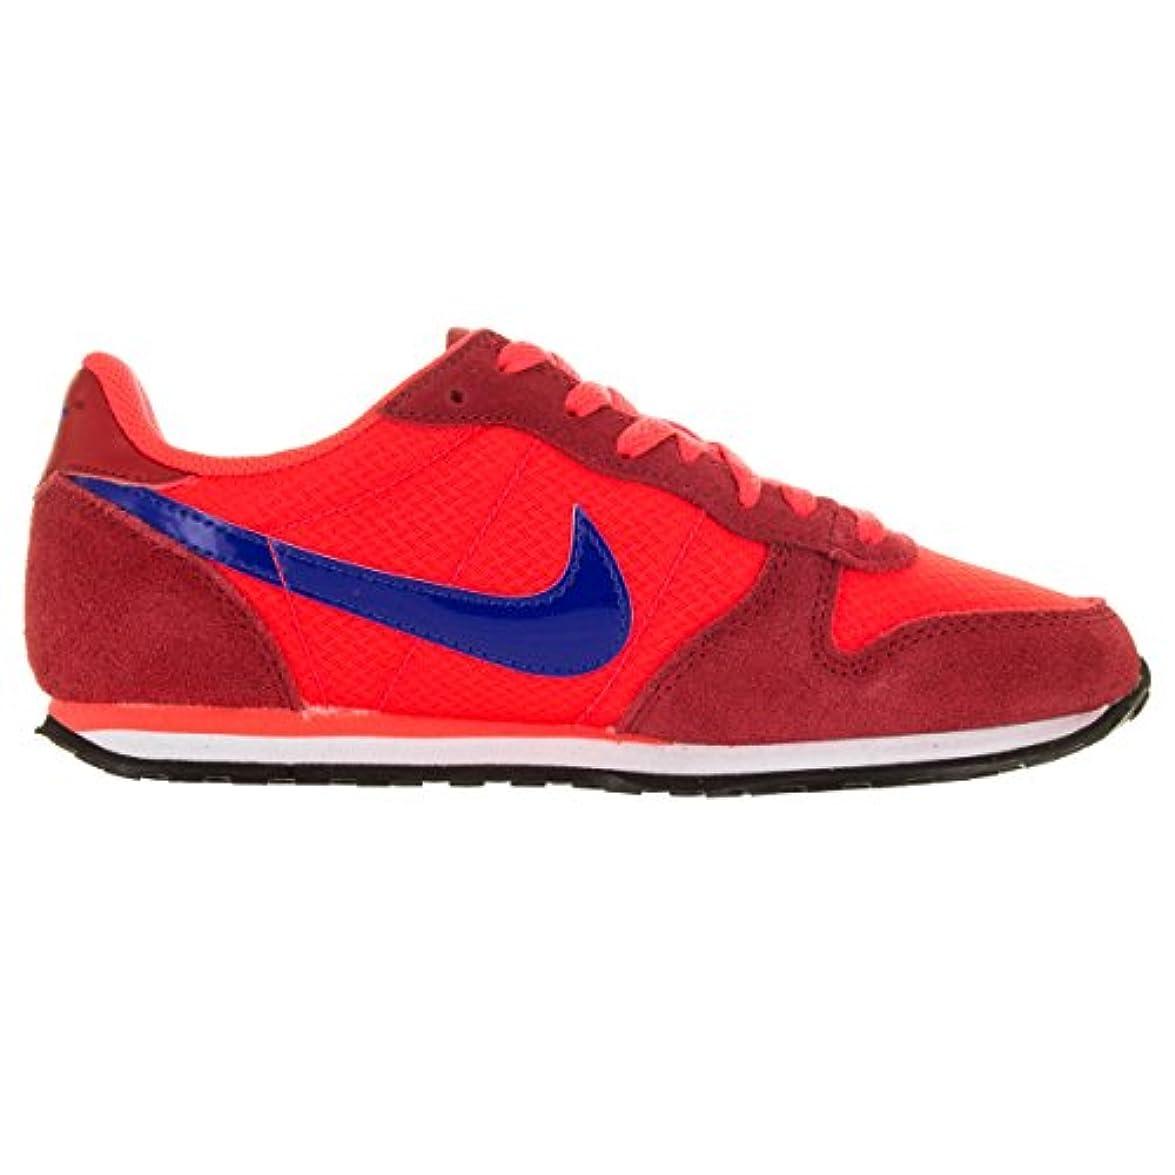 Nike - Wmns Genicco Scarpe Sportive Donna